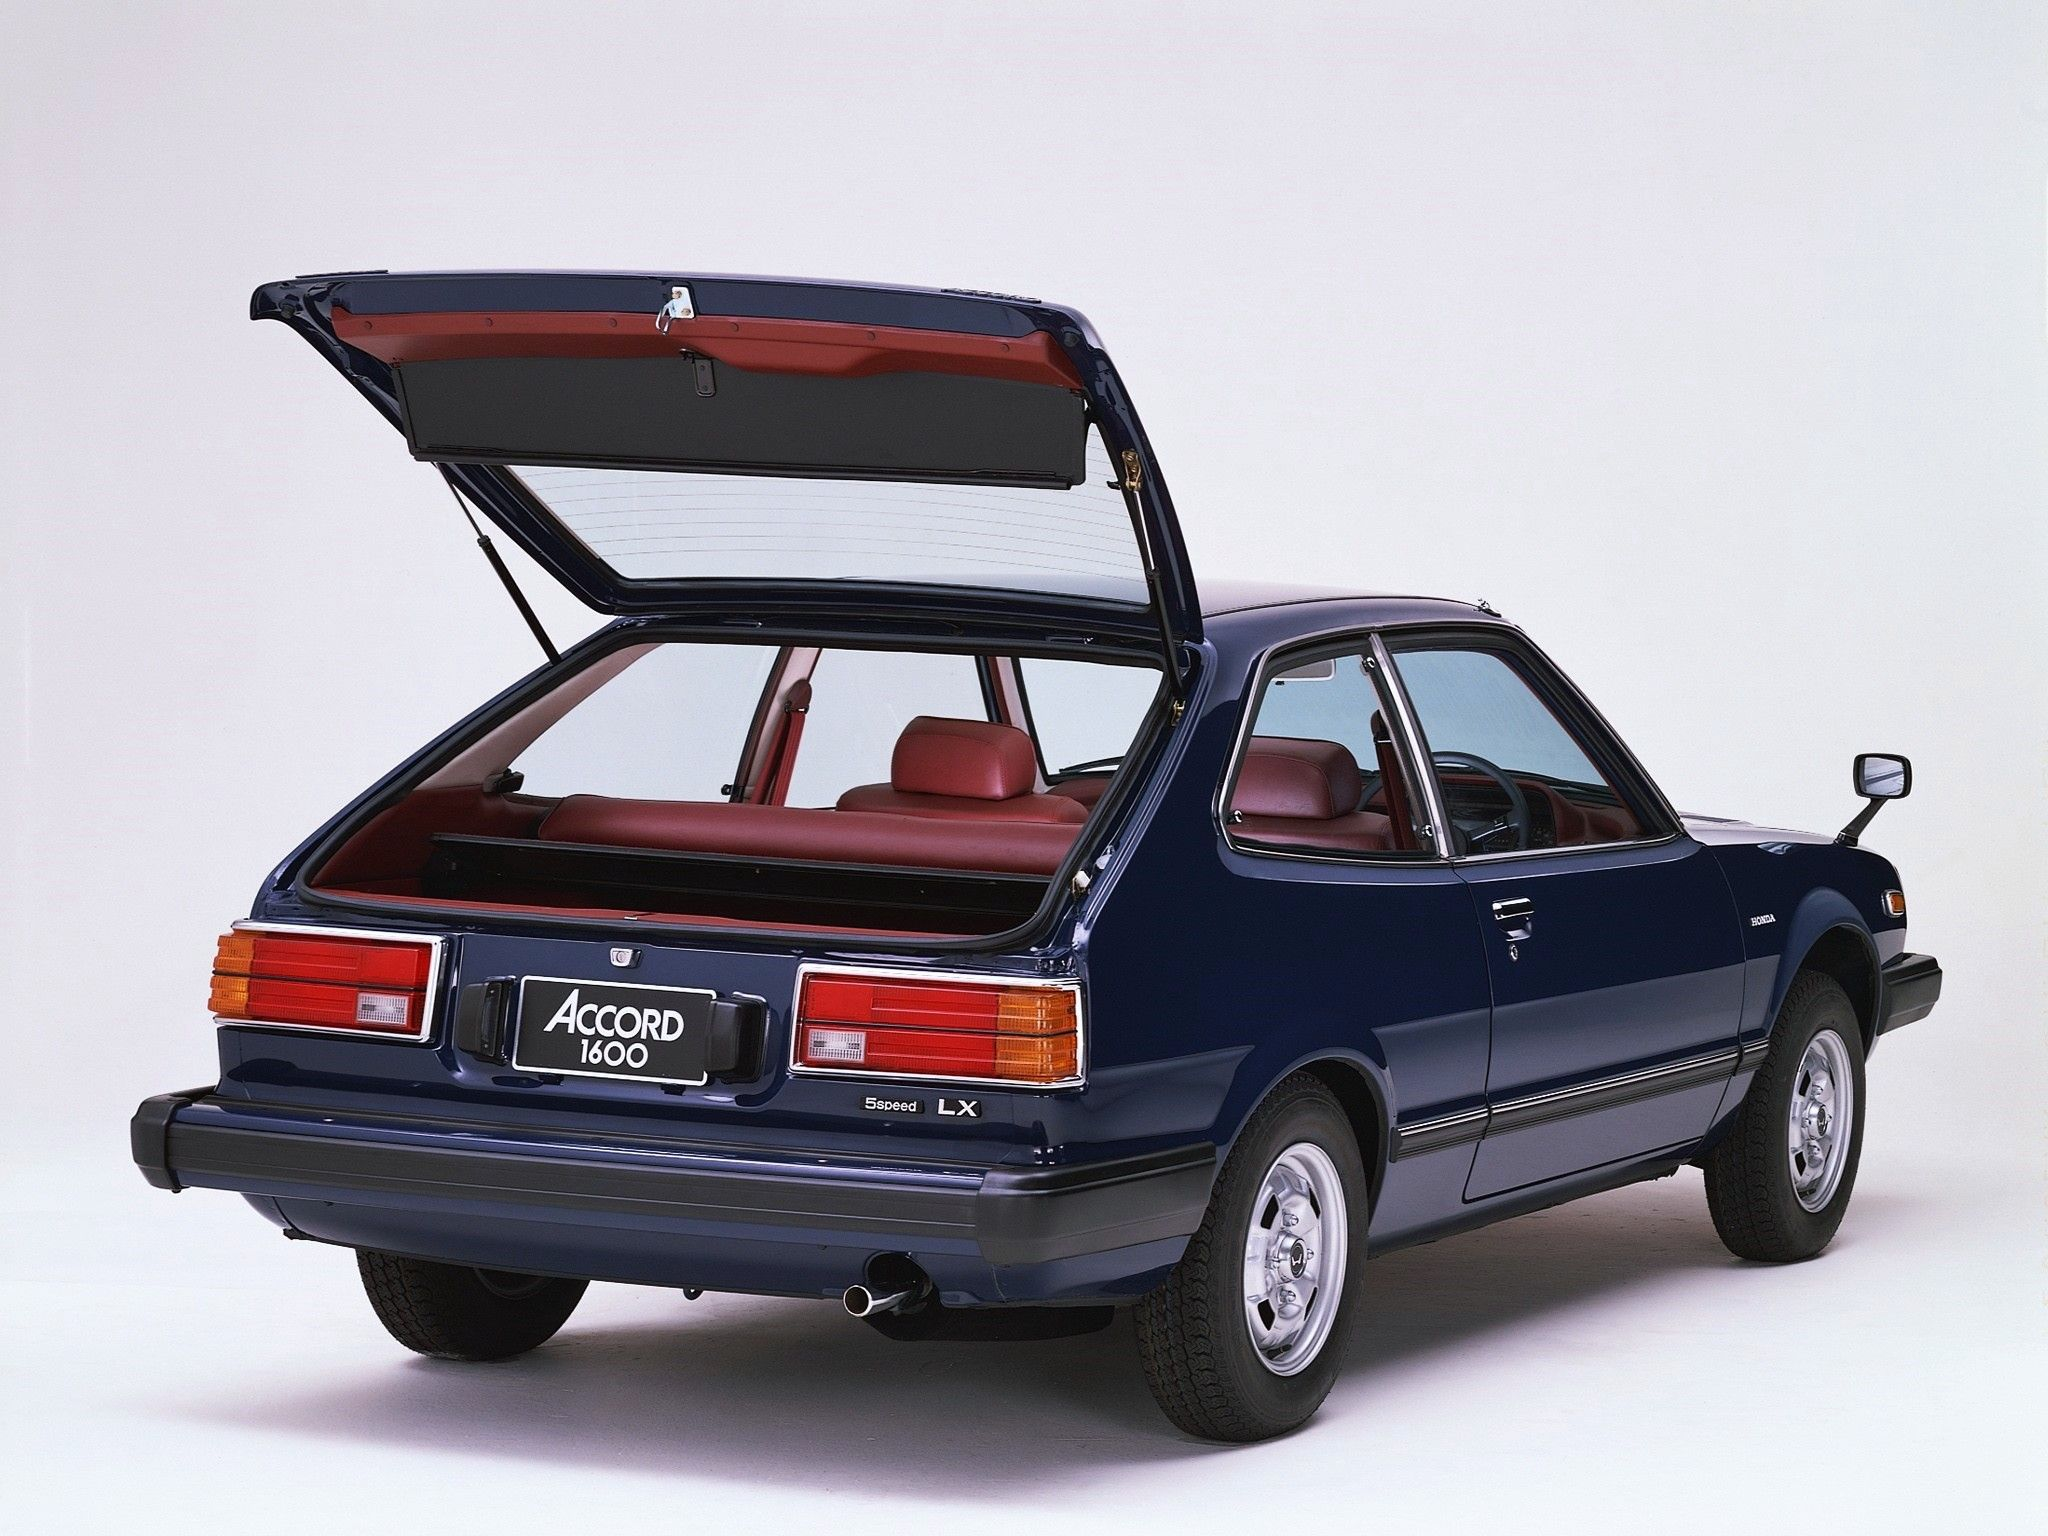 1976 Honda Accord 1600 LX (Japan) Honda accord, Honda